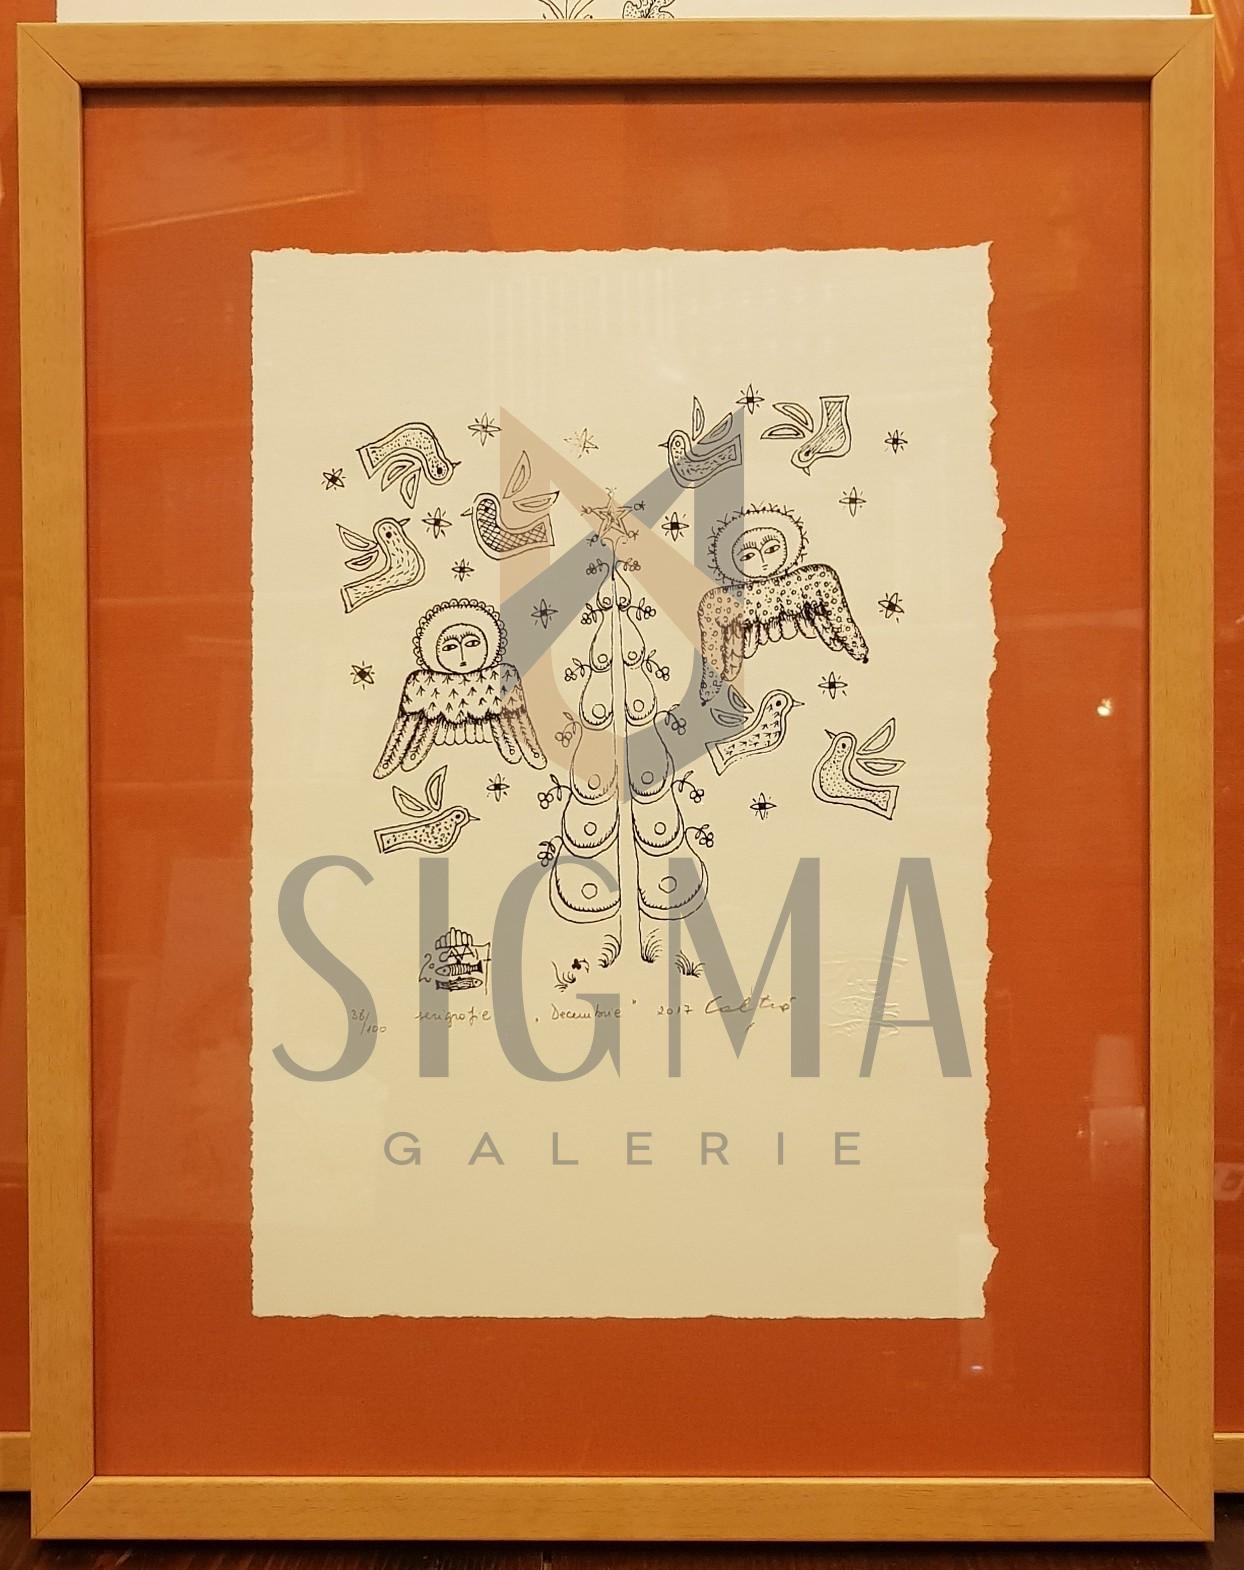 "TABLOU, STEFAN CALTIA "" DECEMBRIE "", serigrafie, 2017"